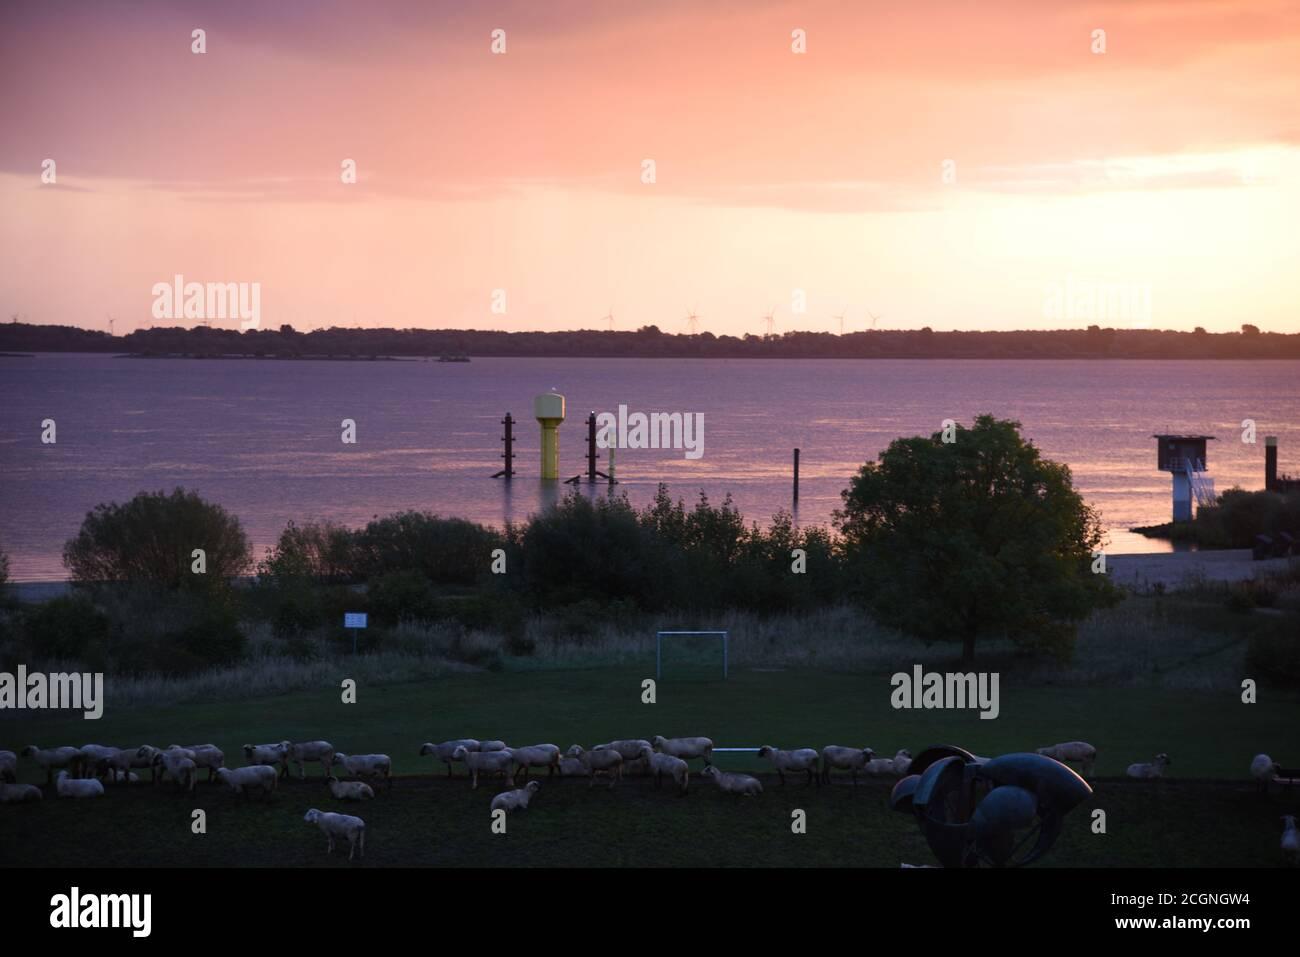 Bel tempo-atmosfera a Krautsand Foto Stock